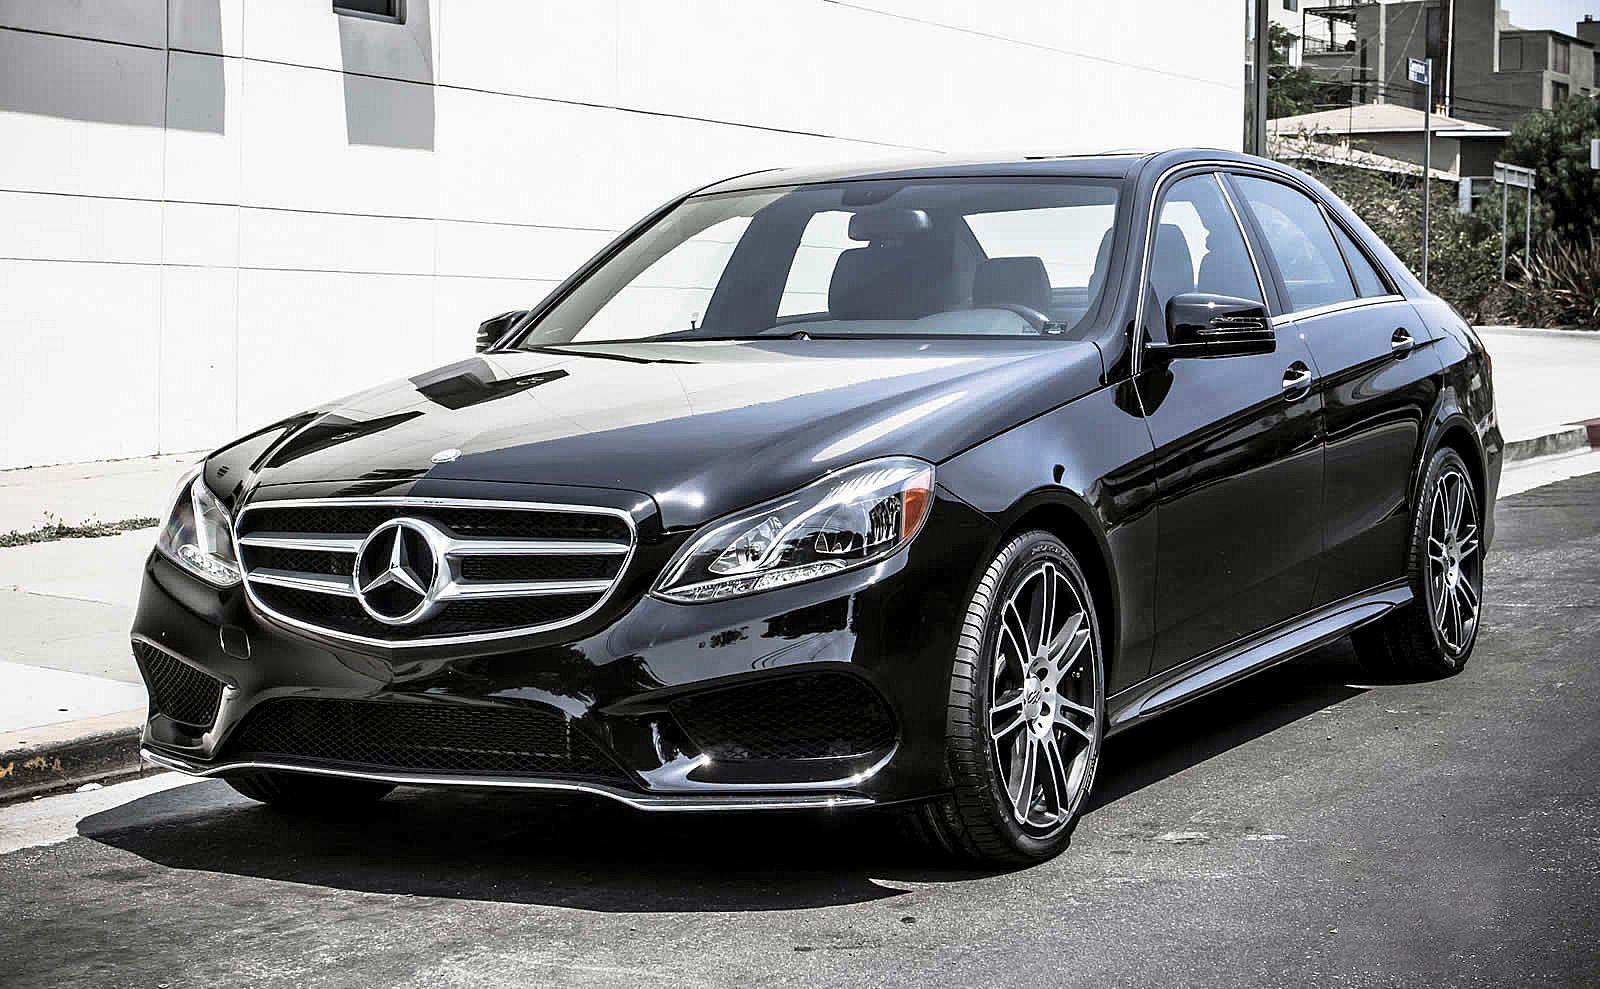 Mercedes E 220 | Black | 2015 | #rent #lxuury #executive #e